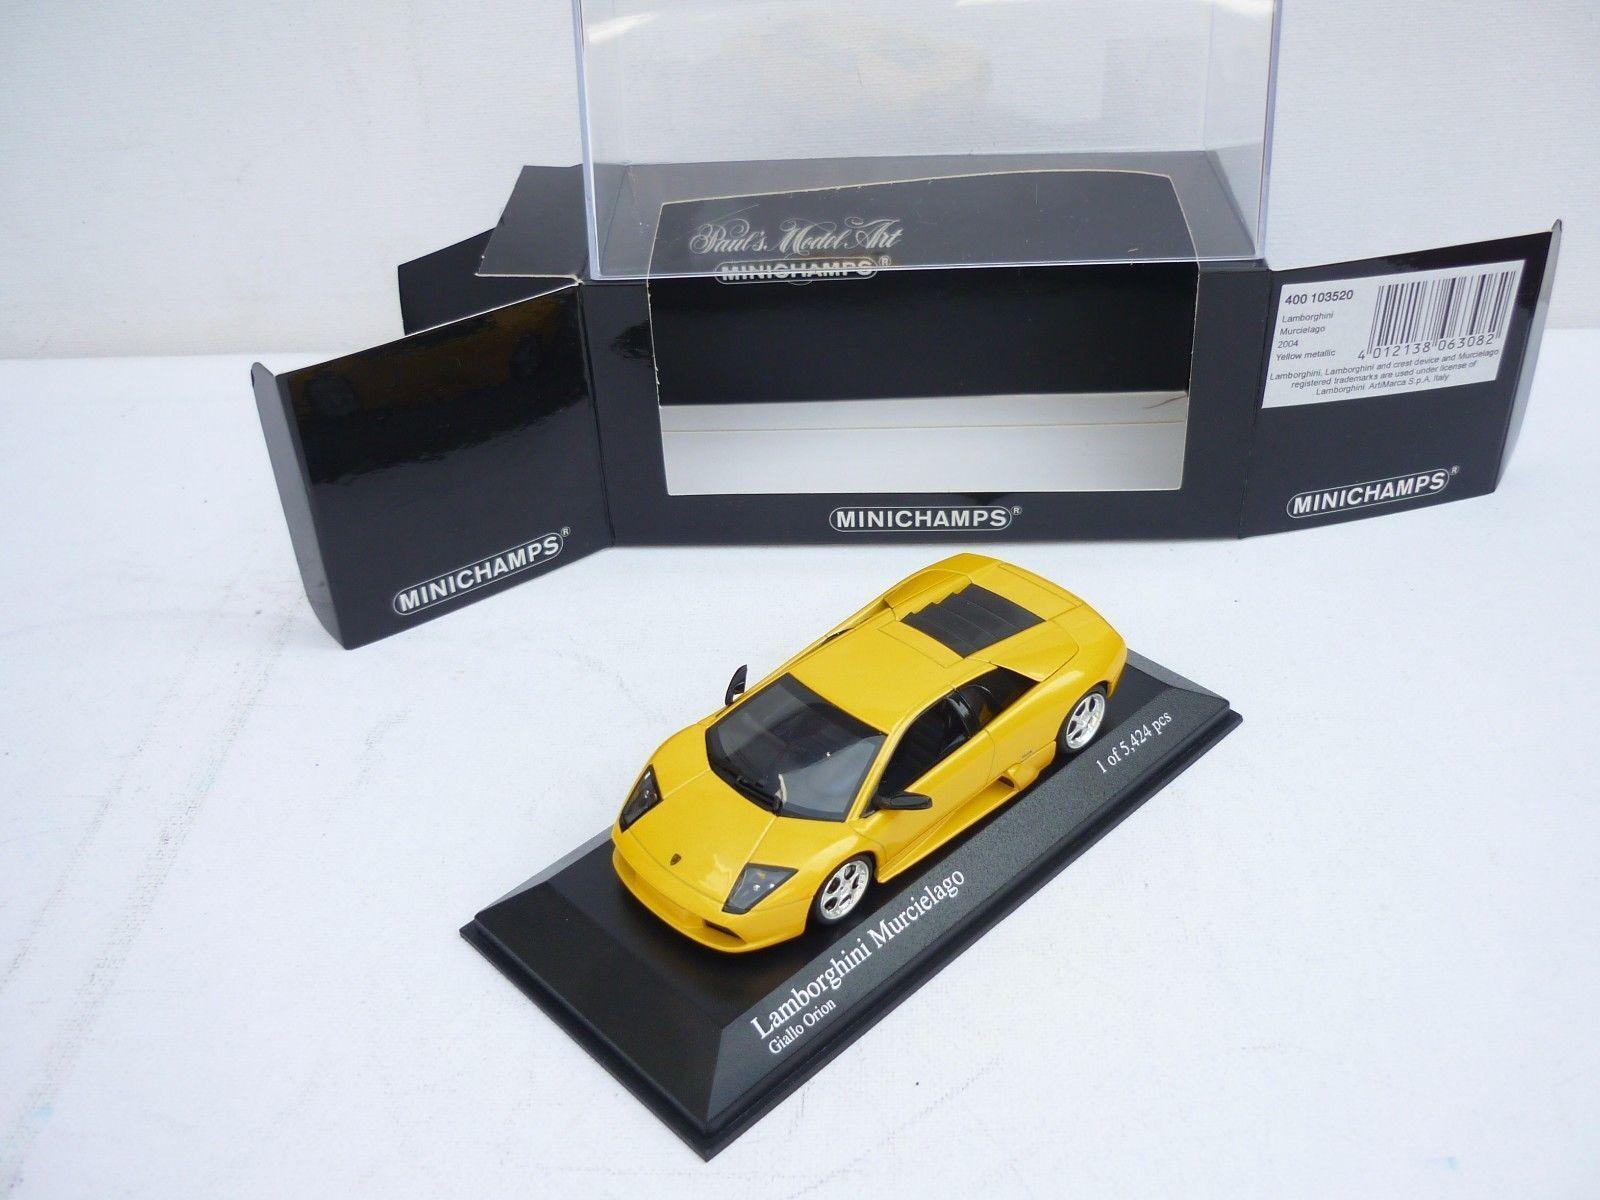 Lamborghini Murcielago, Yellow 2001 Cars, Minichamps 400 103520 103520 103520 Diecast 1 43 NEW 6f244d